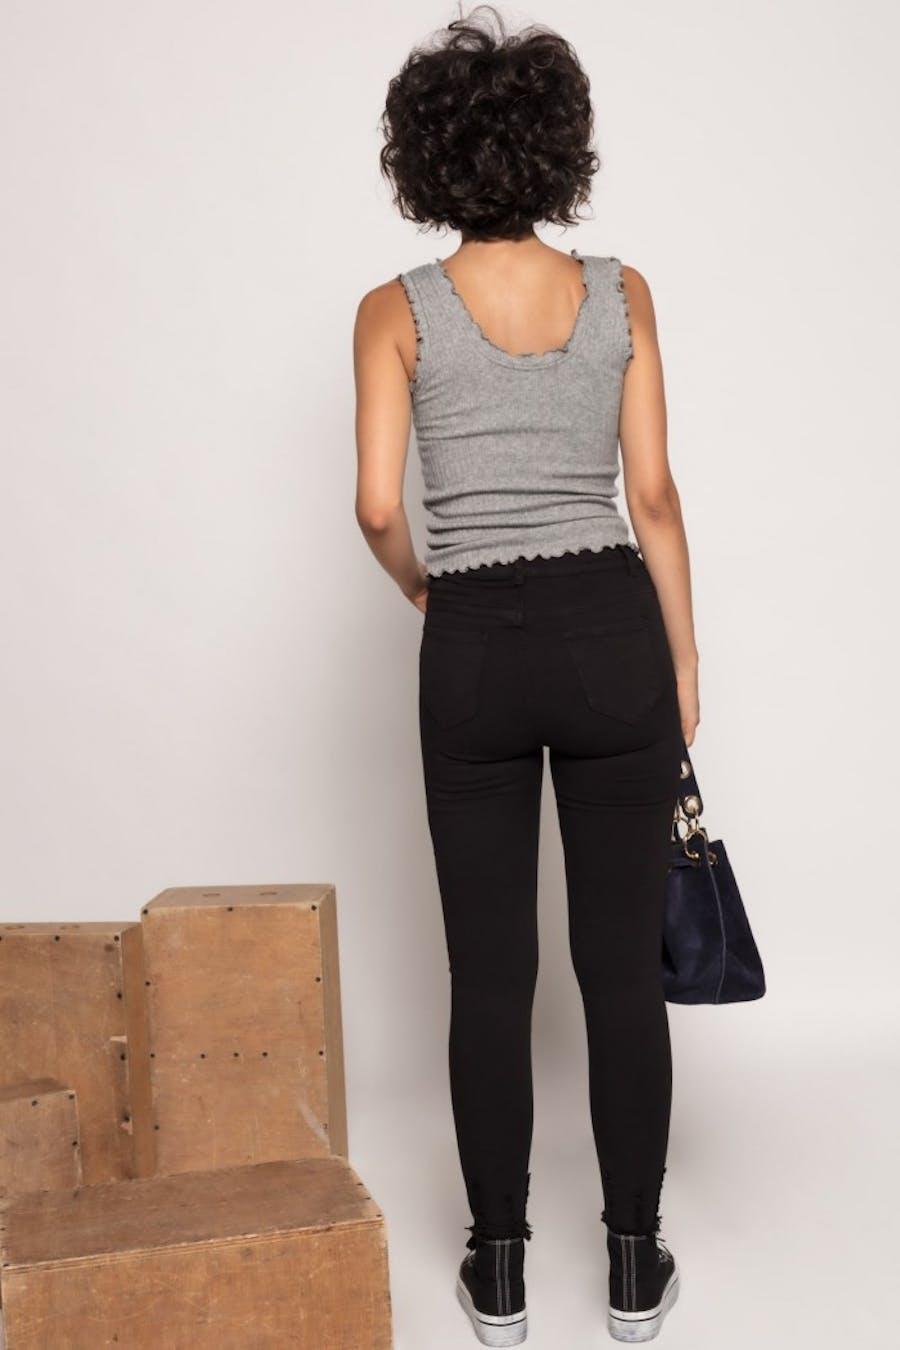 Jeans laulia high waist